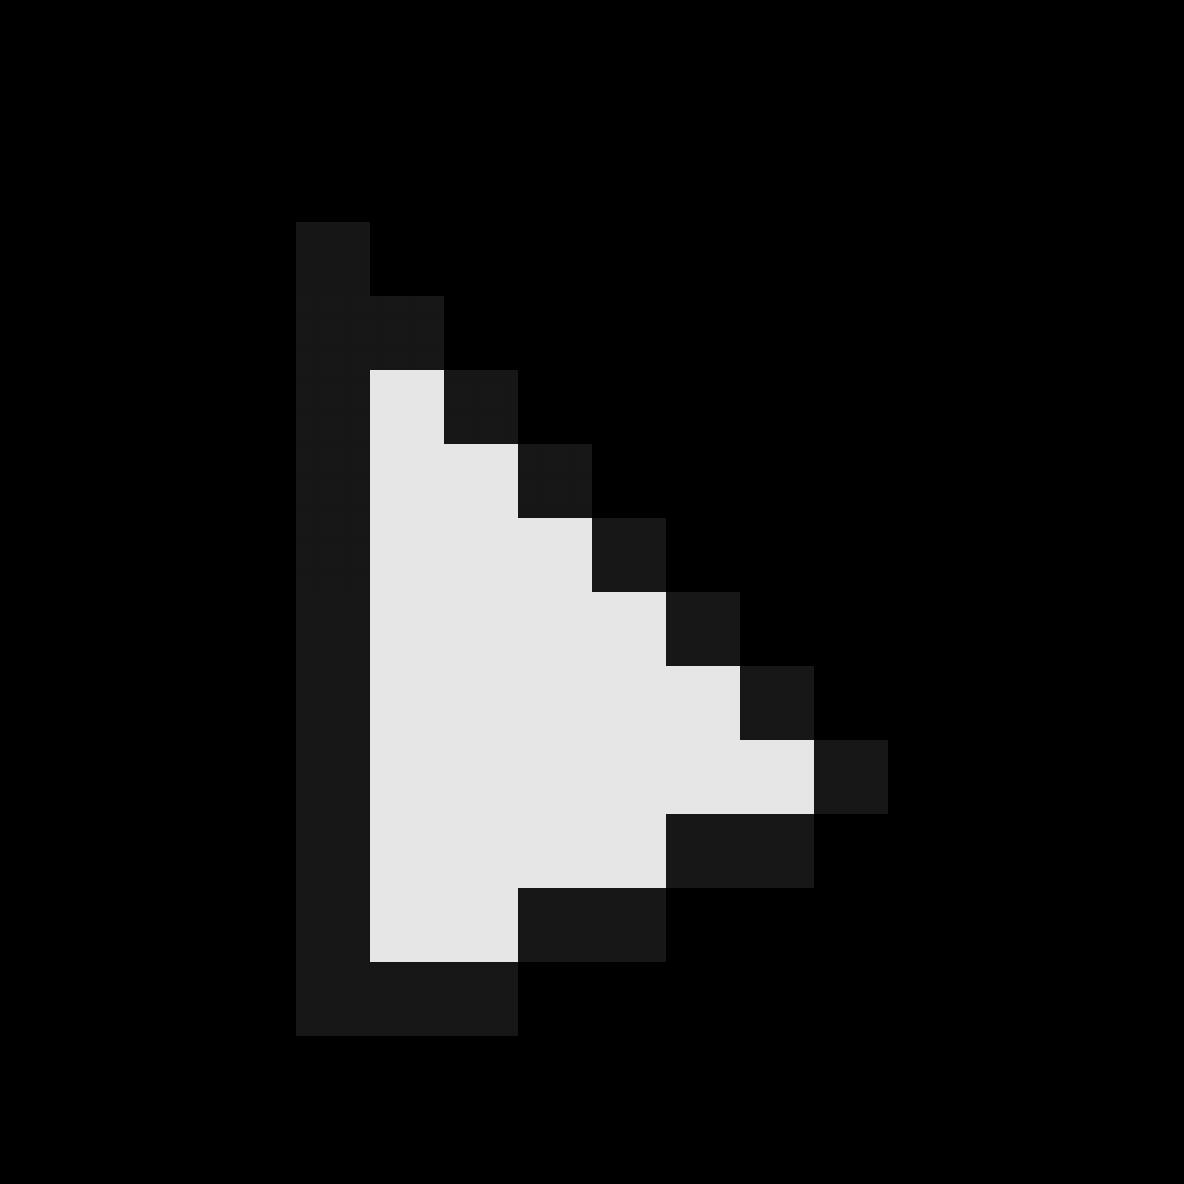 курсор из майнкрафт для windows 7 #4